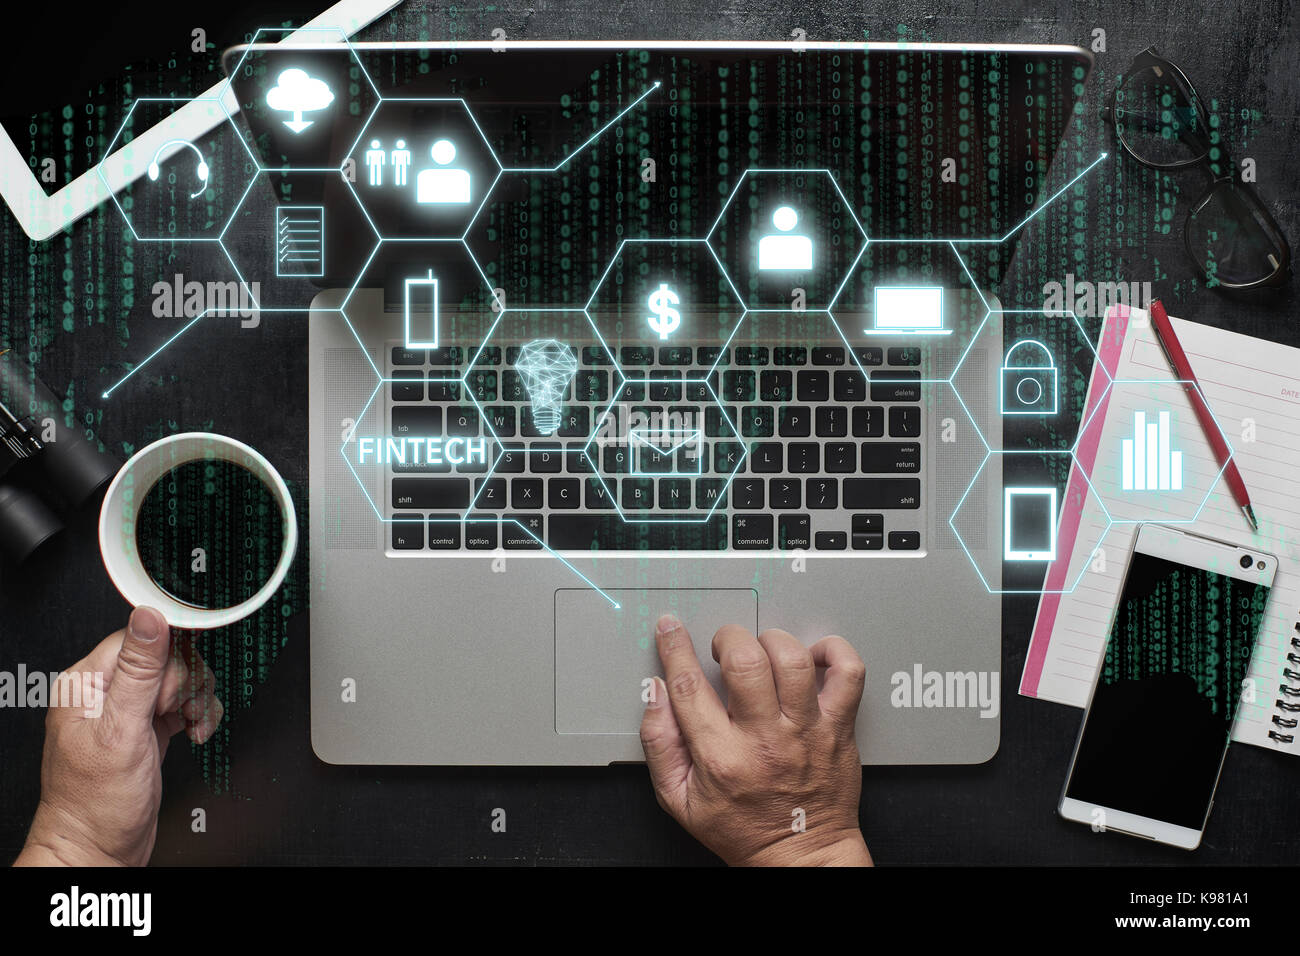 'Fintech' word on digital virtual screen with laptop, male hands, notebook,eyeglasses, sketchbook, black - Stock Image